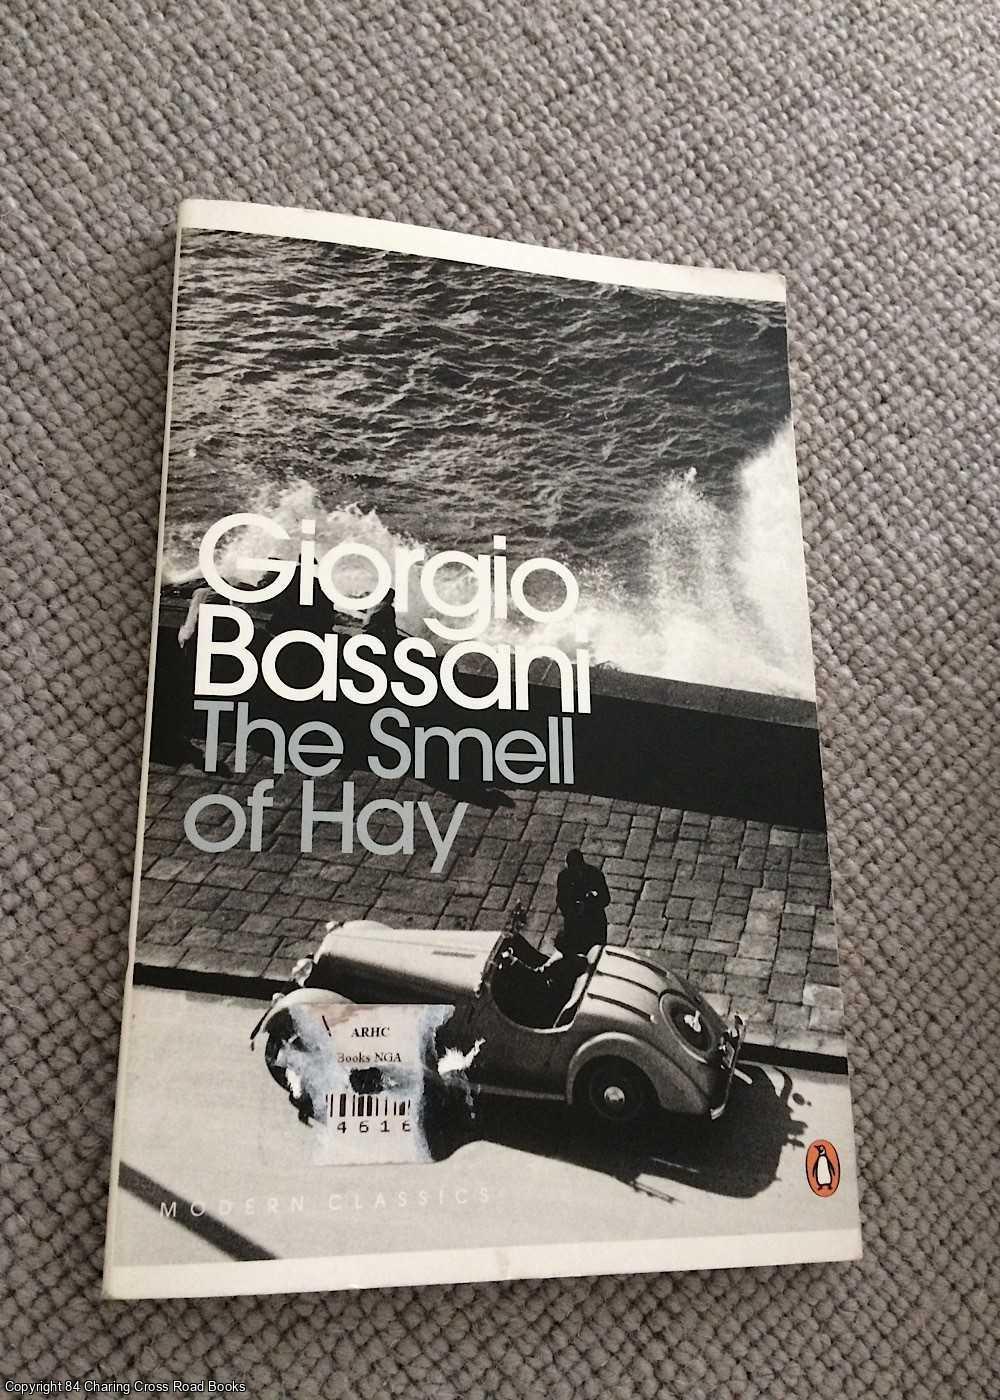 GIORGIO BASSANI - The Smell of Hay